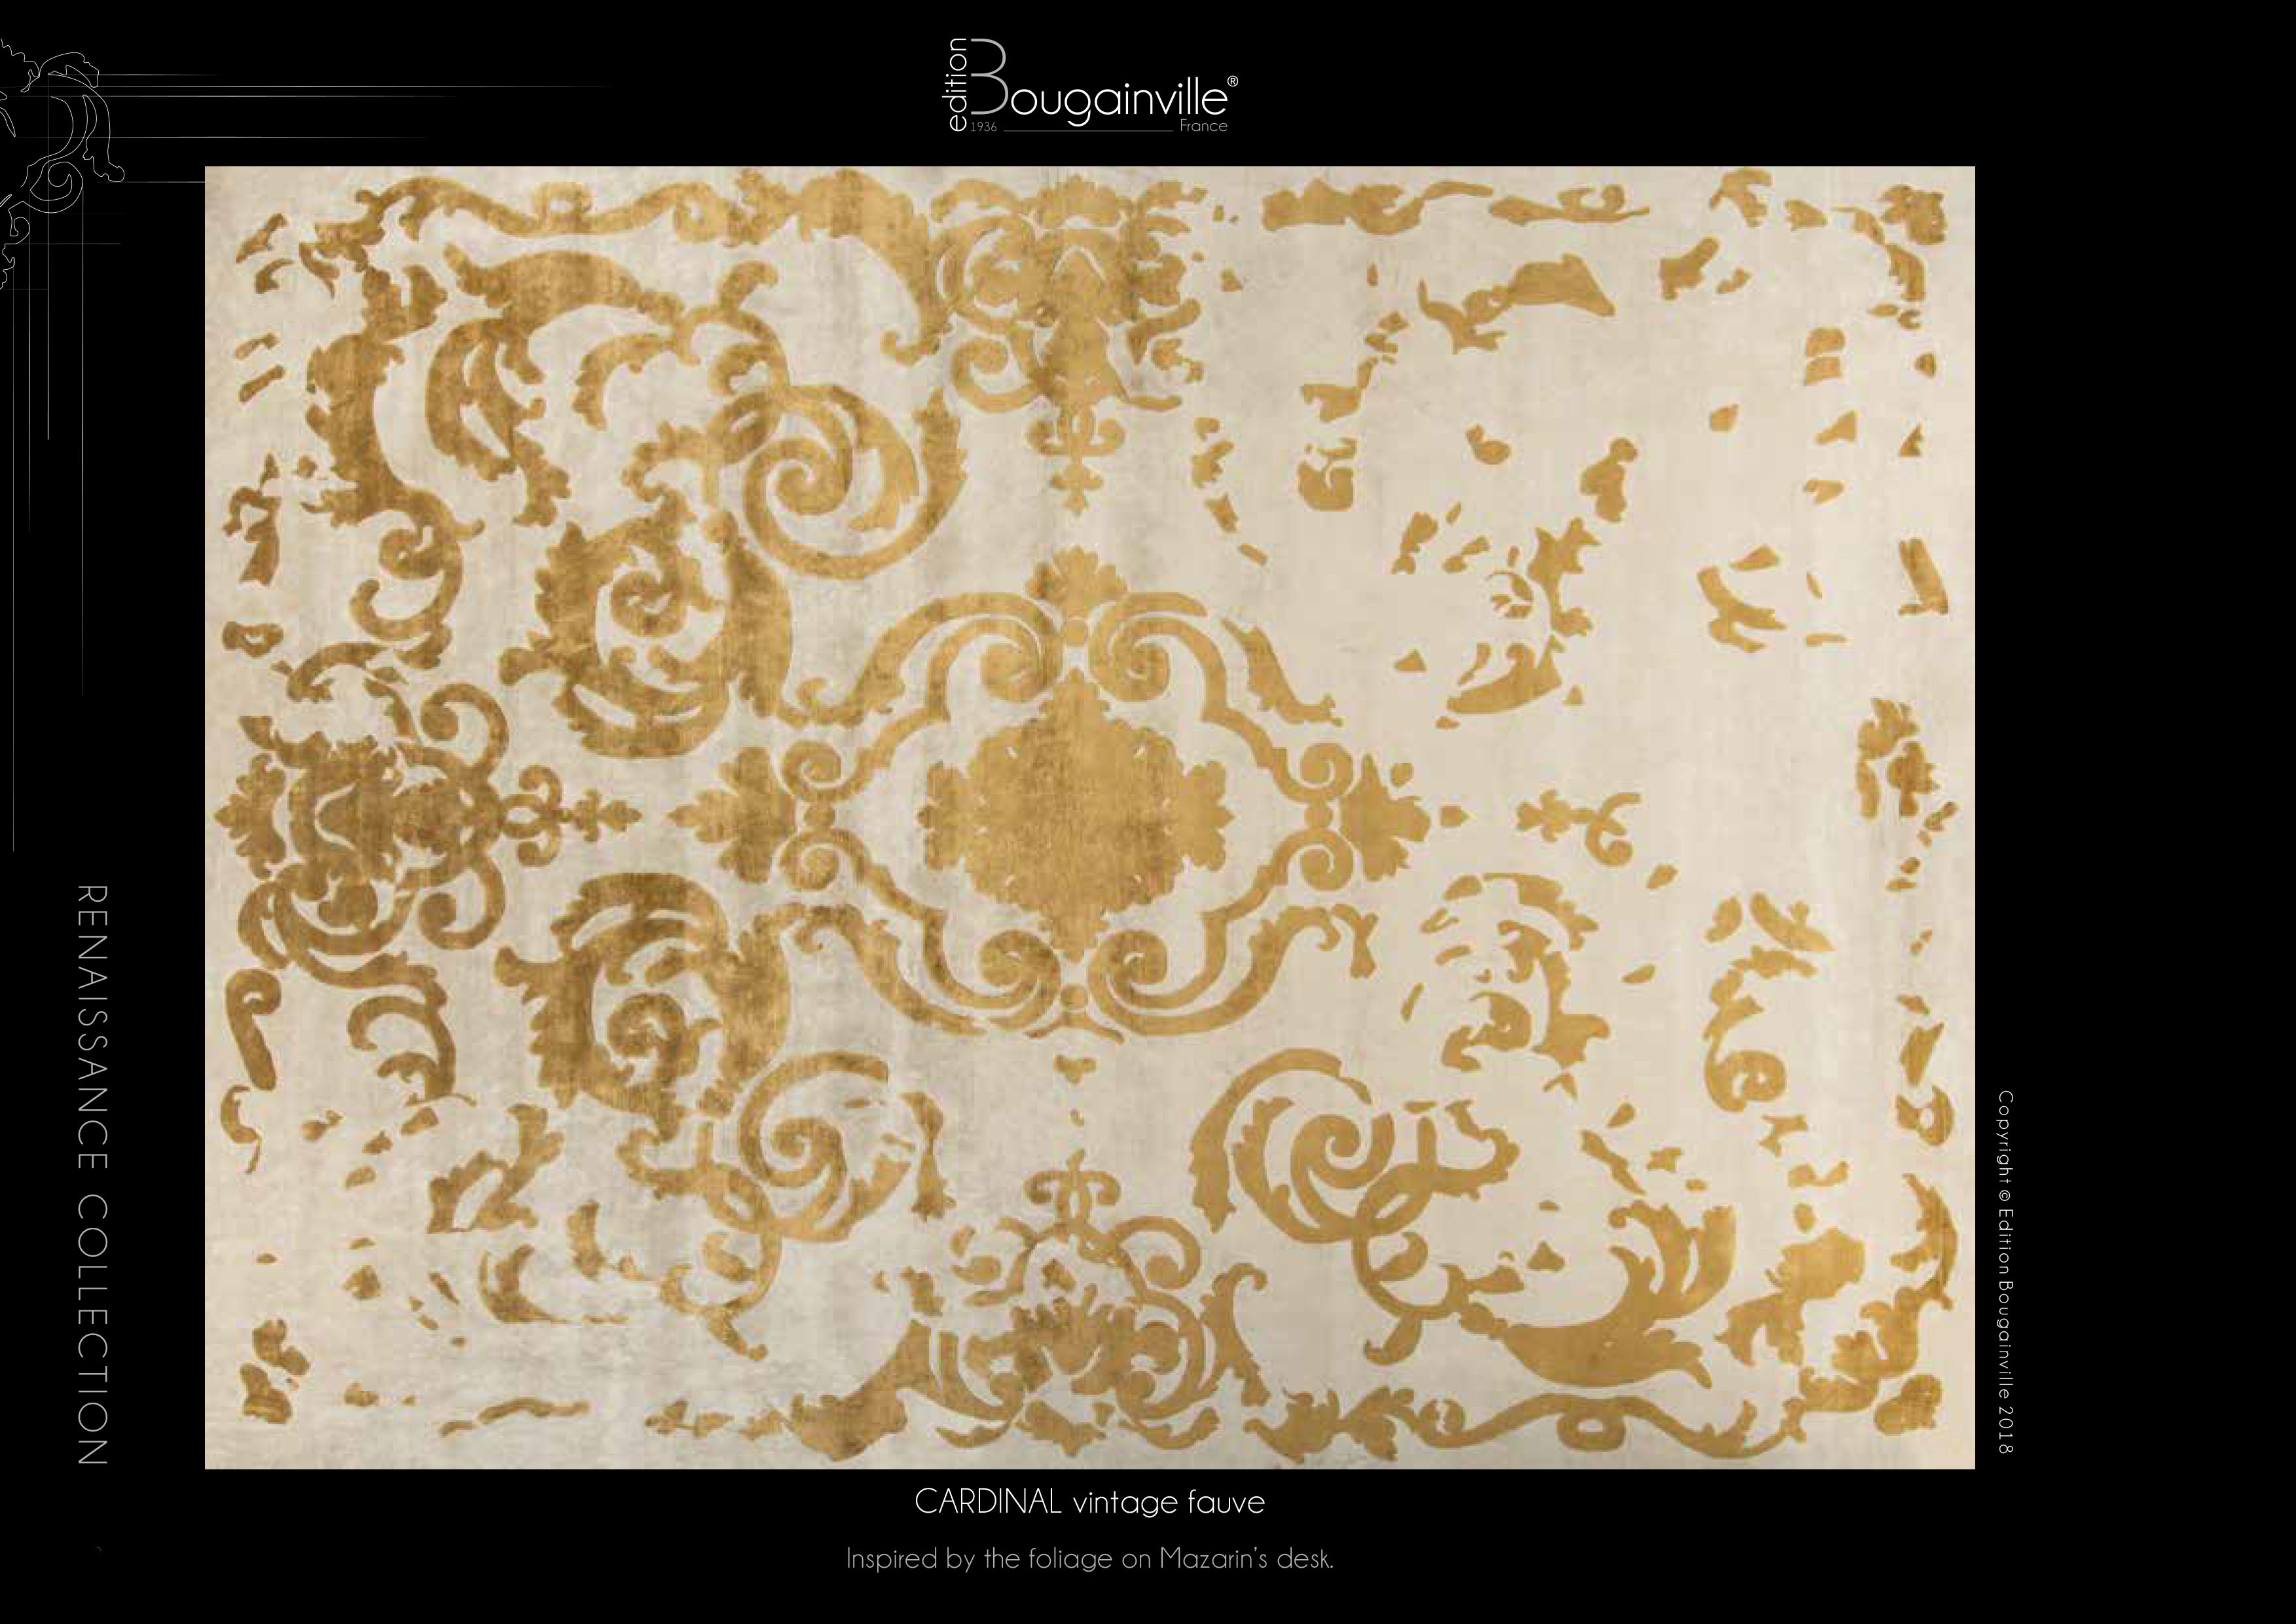 Ковер Edition Bougainville, CARDINAL vintage fauve